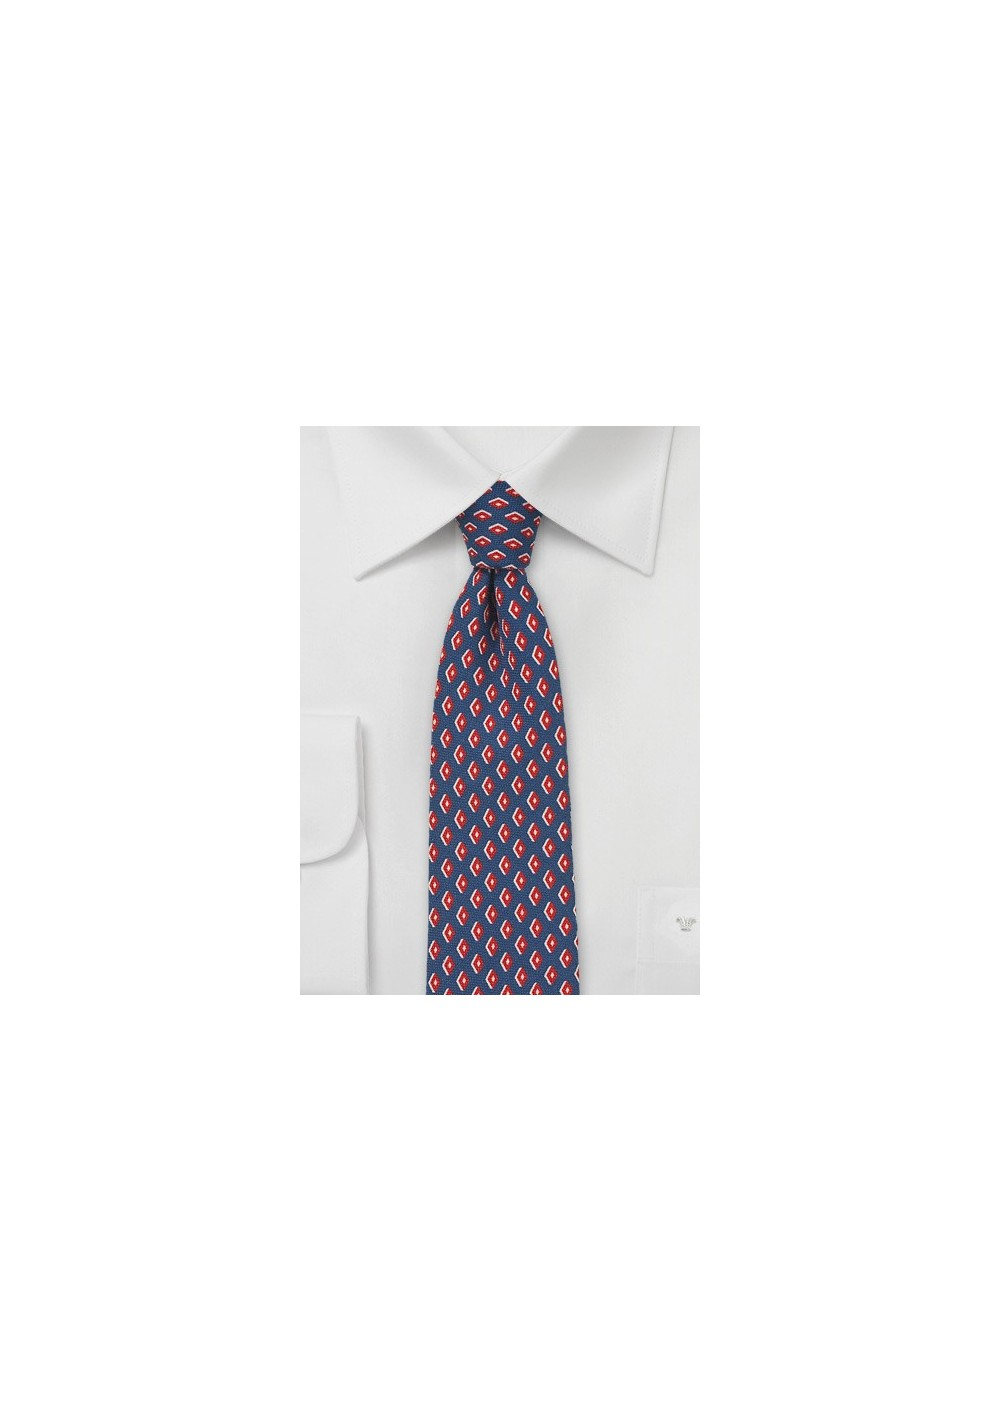 Retro 60s Print Necktie in Skinny Cut